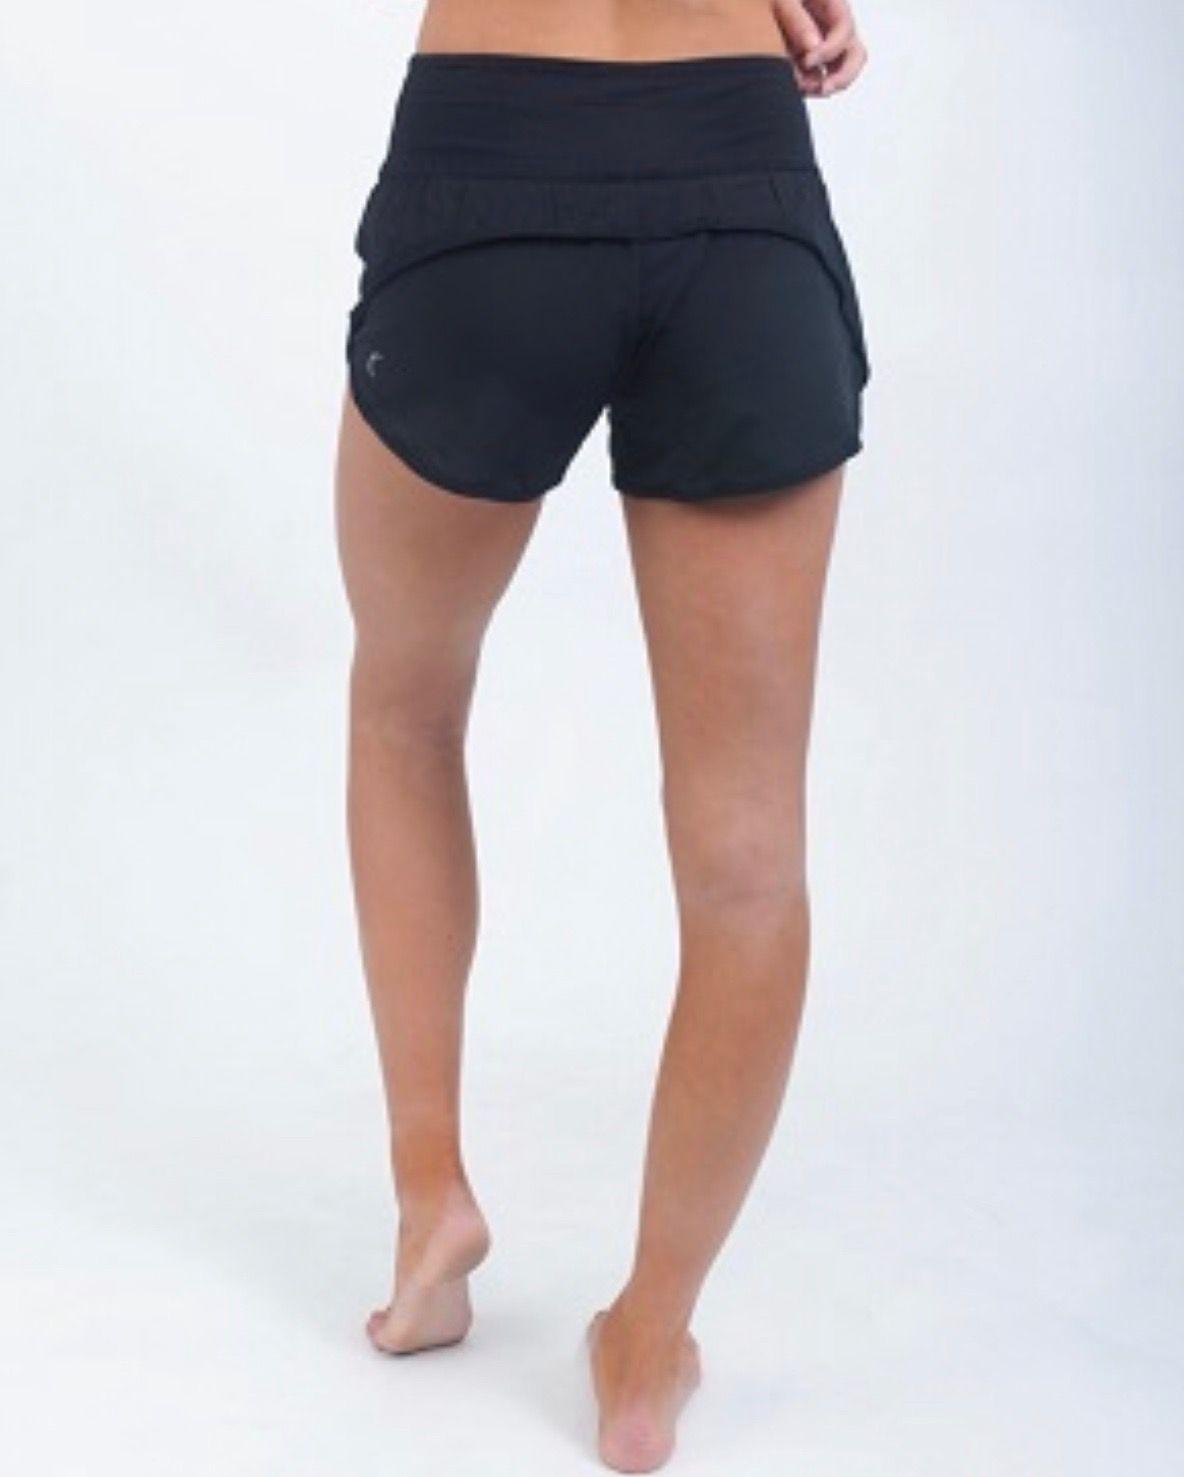 Black Trainer Shorts! | Black trainers